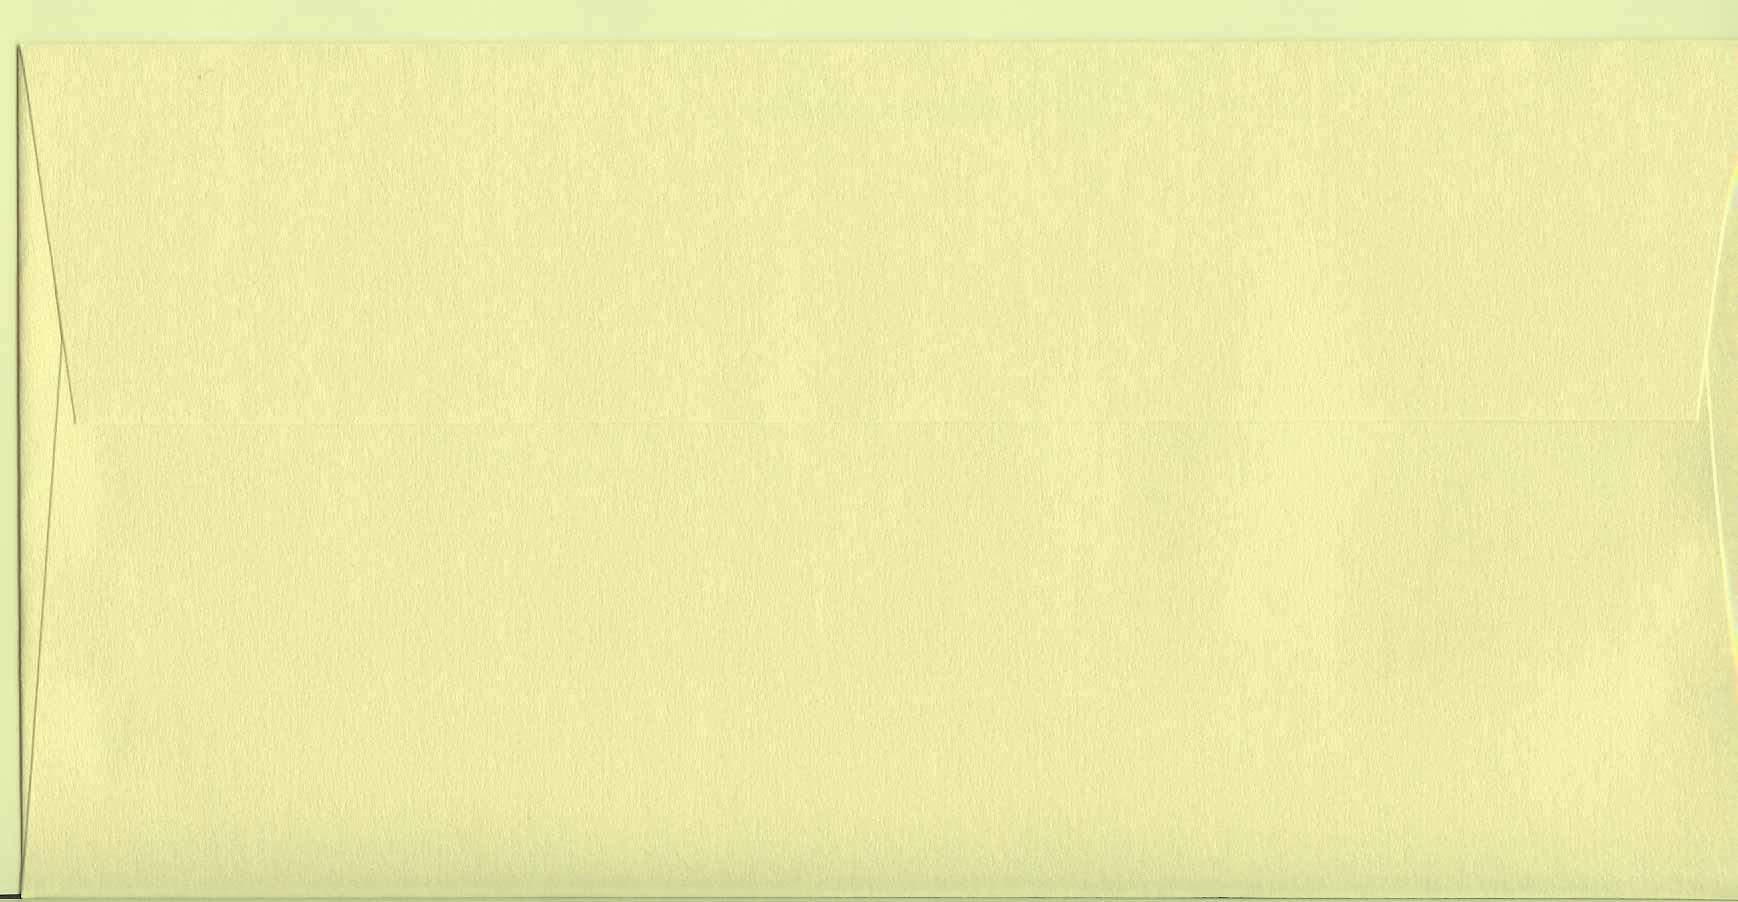 Imprimir Cheques En Papel En Blanco Descargar Gratis Imprimir Cheques  apexw...